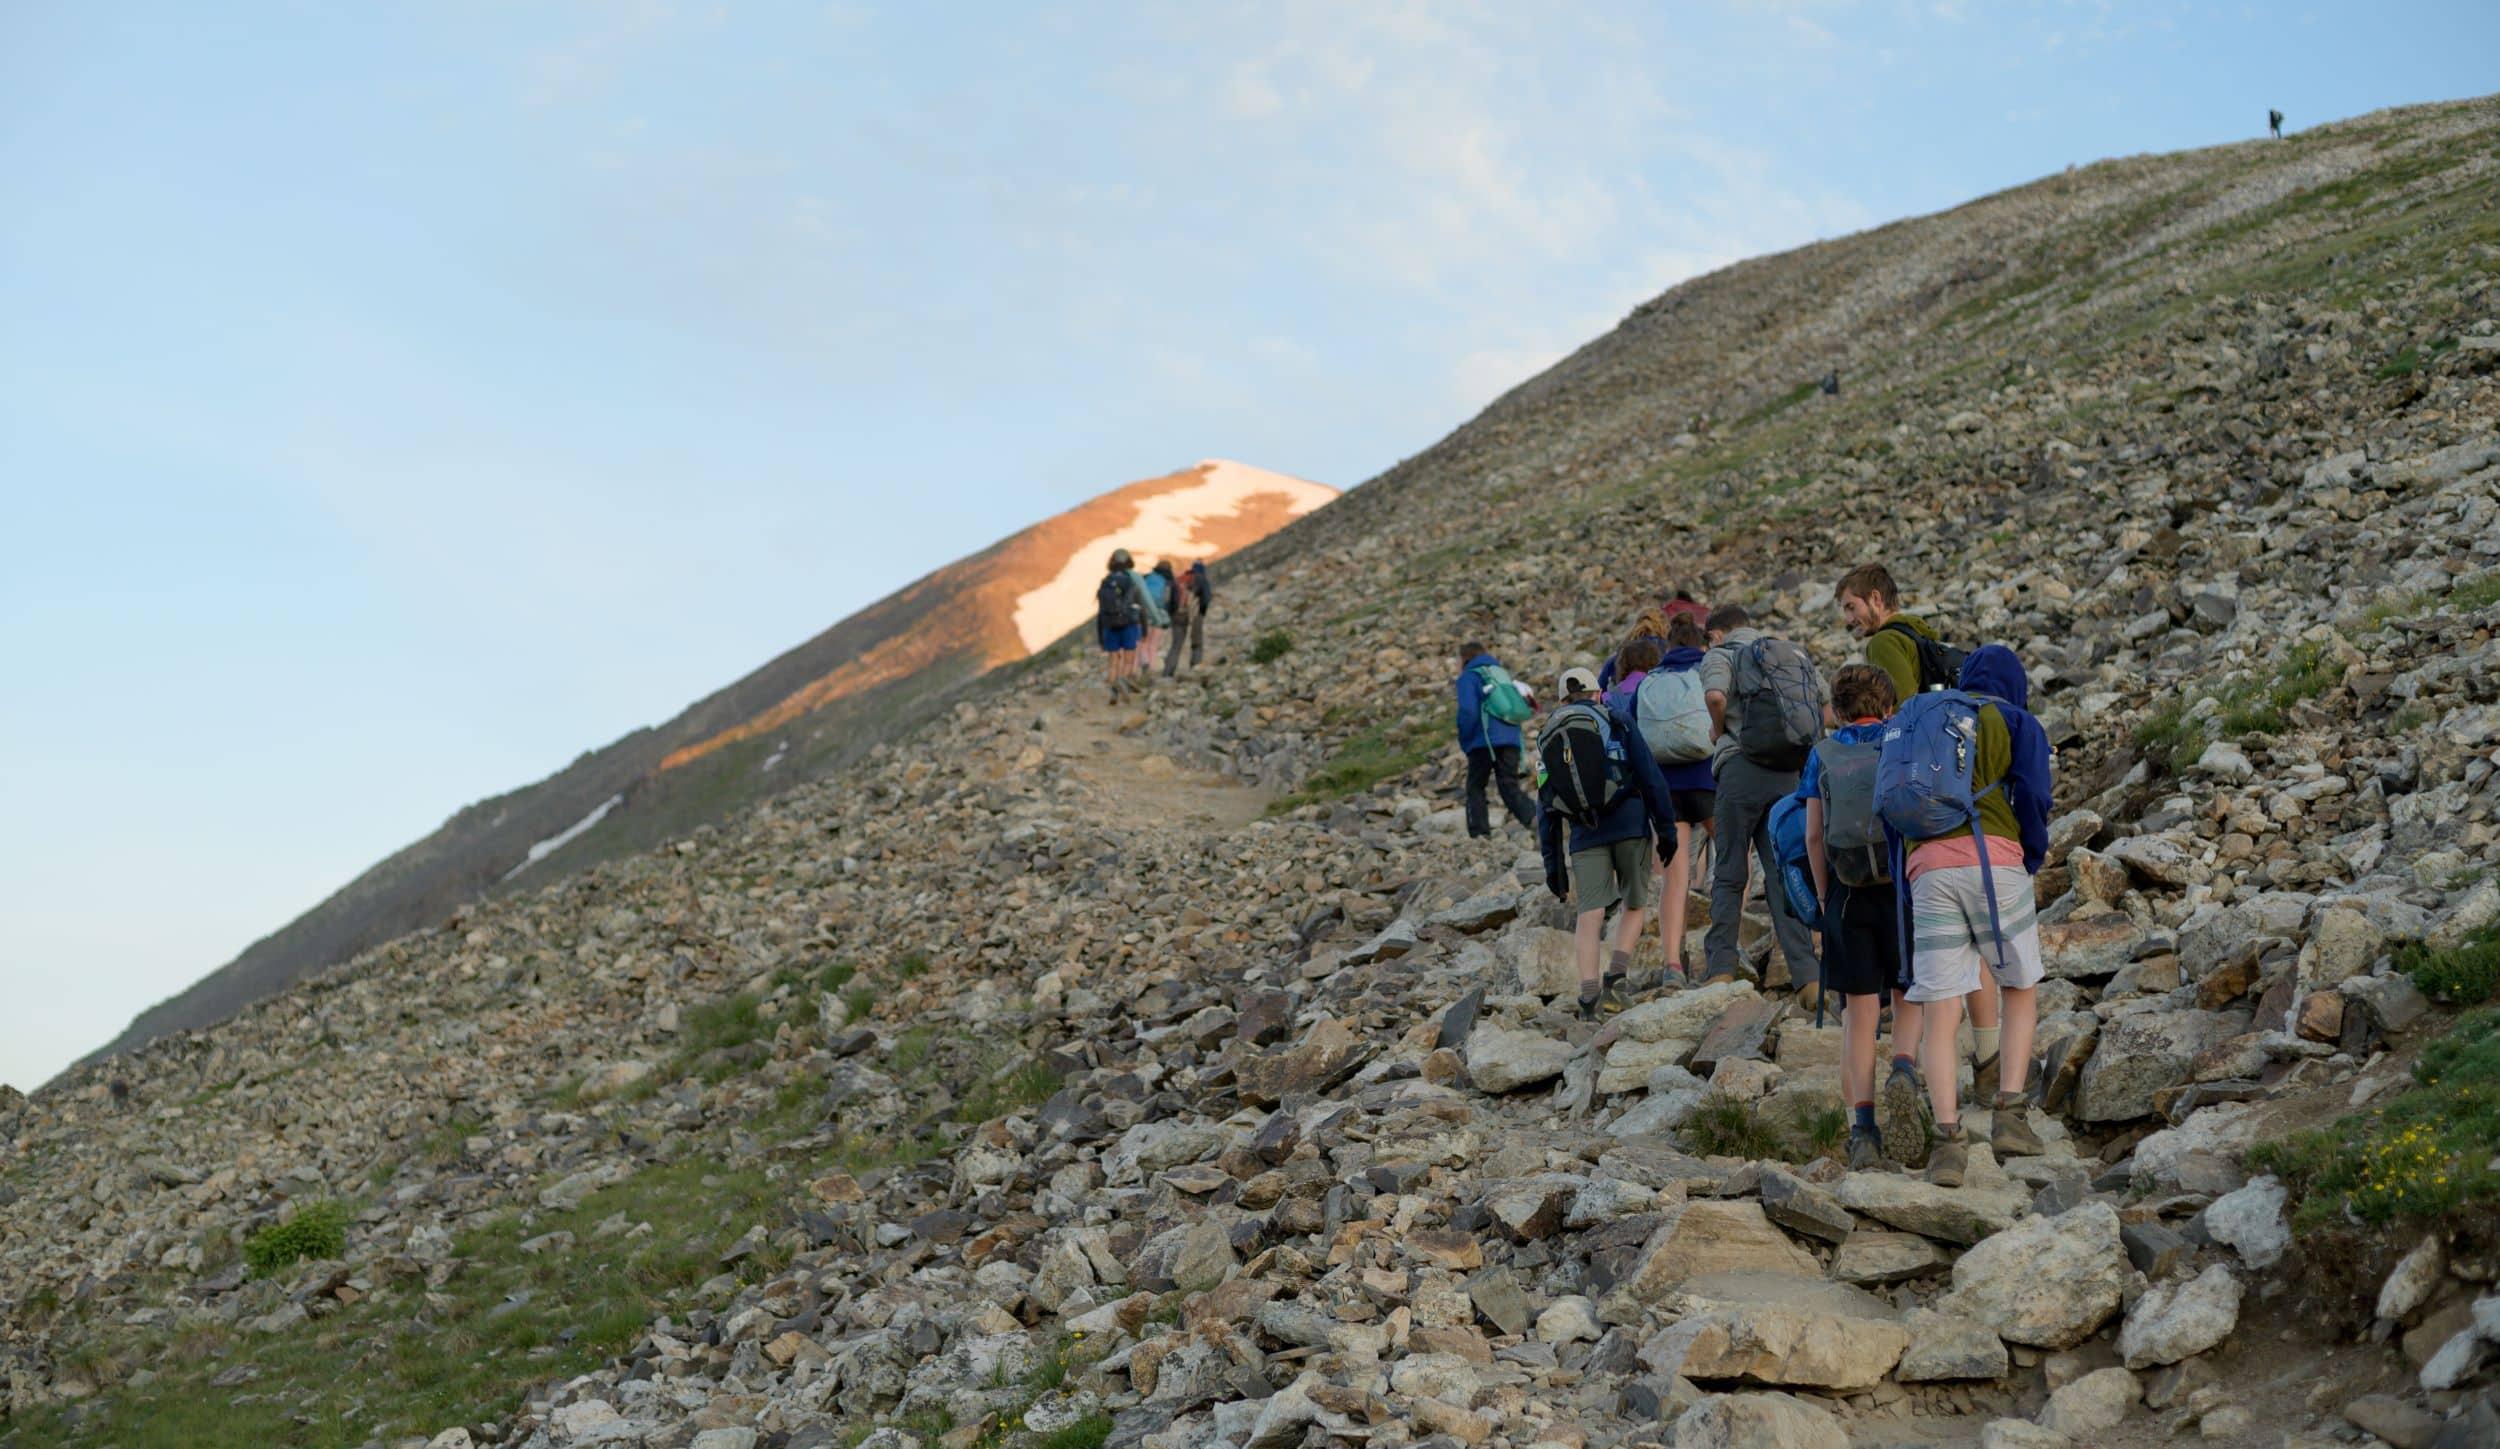 Teen adventure program in the Rocky Mountains